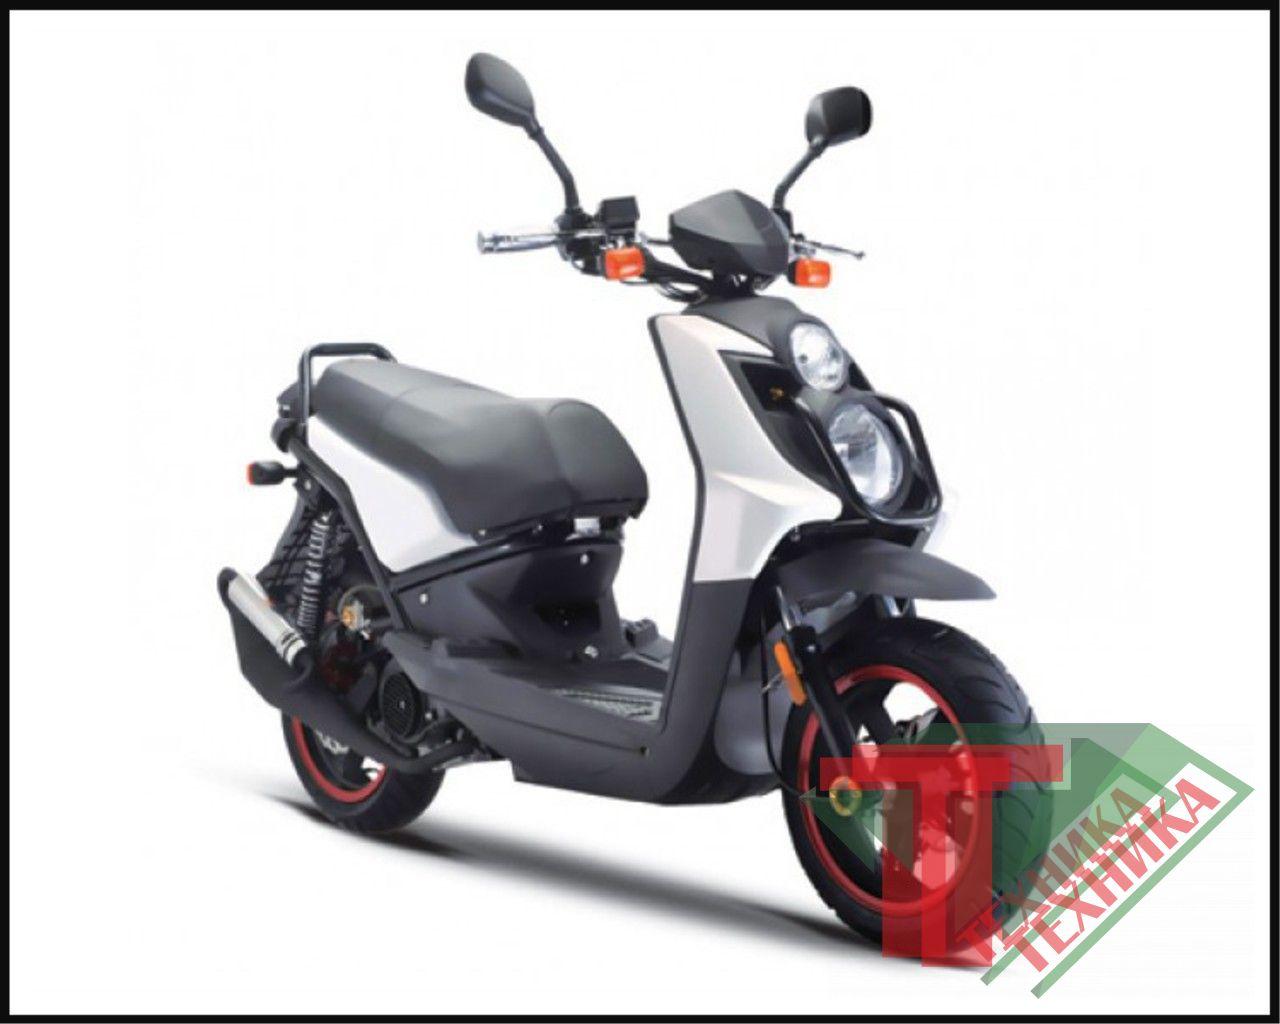 Мотороллер JJ 150T-7 Bumer 150cc